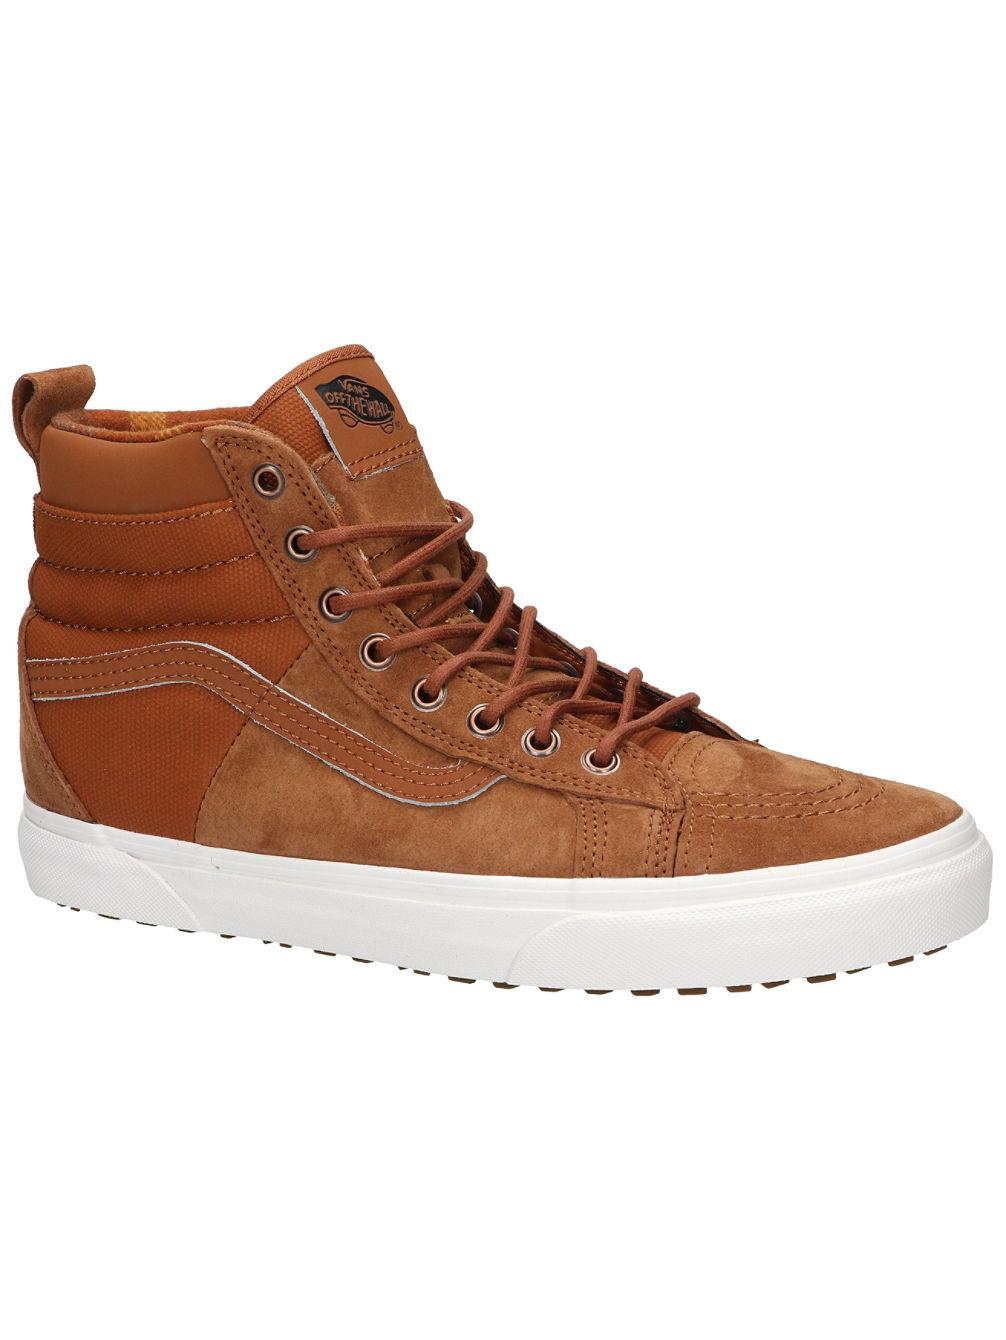 Buy Vans Sk8-Hi 46 MTE DX Shoes online at blue-tomato.com 9e1f706e8